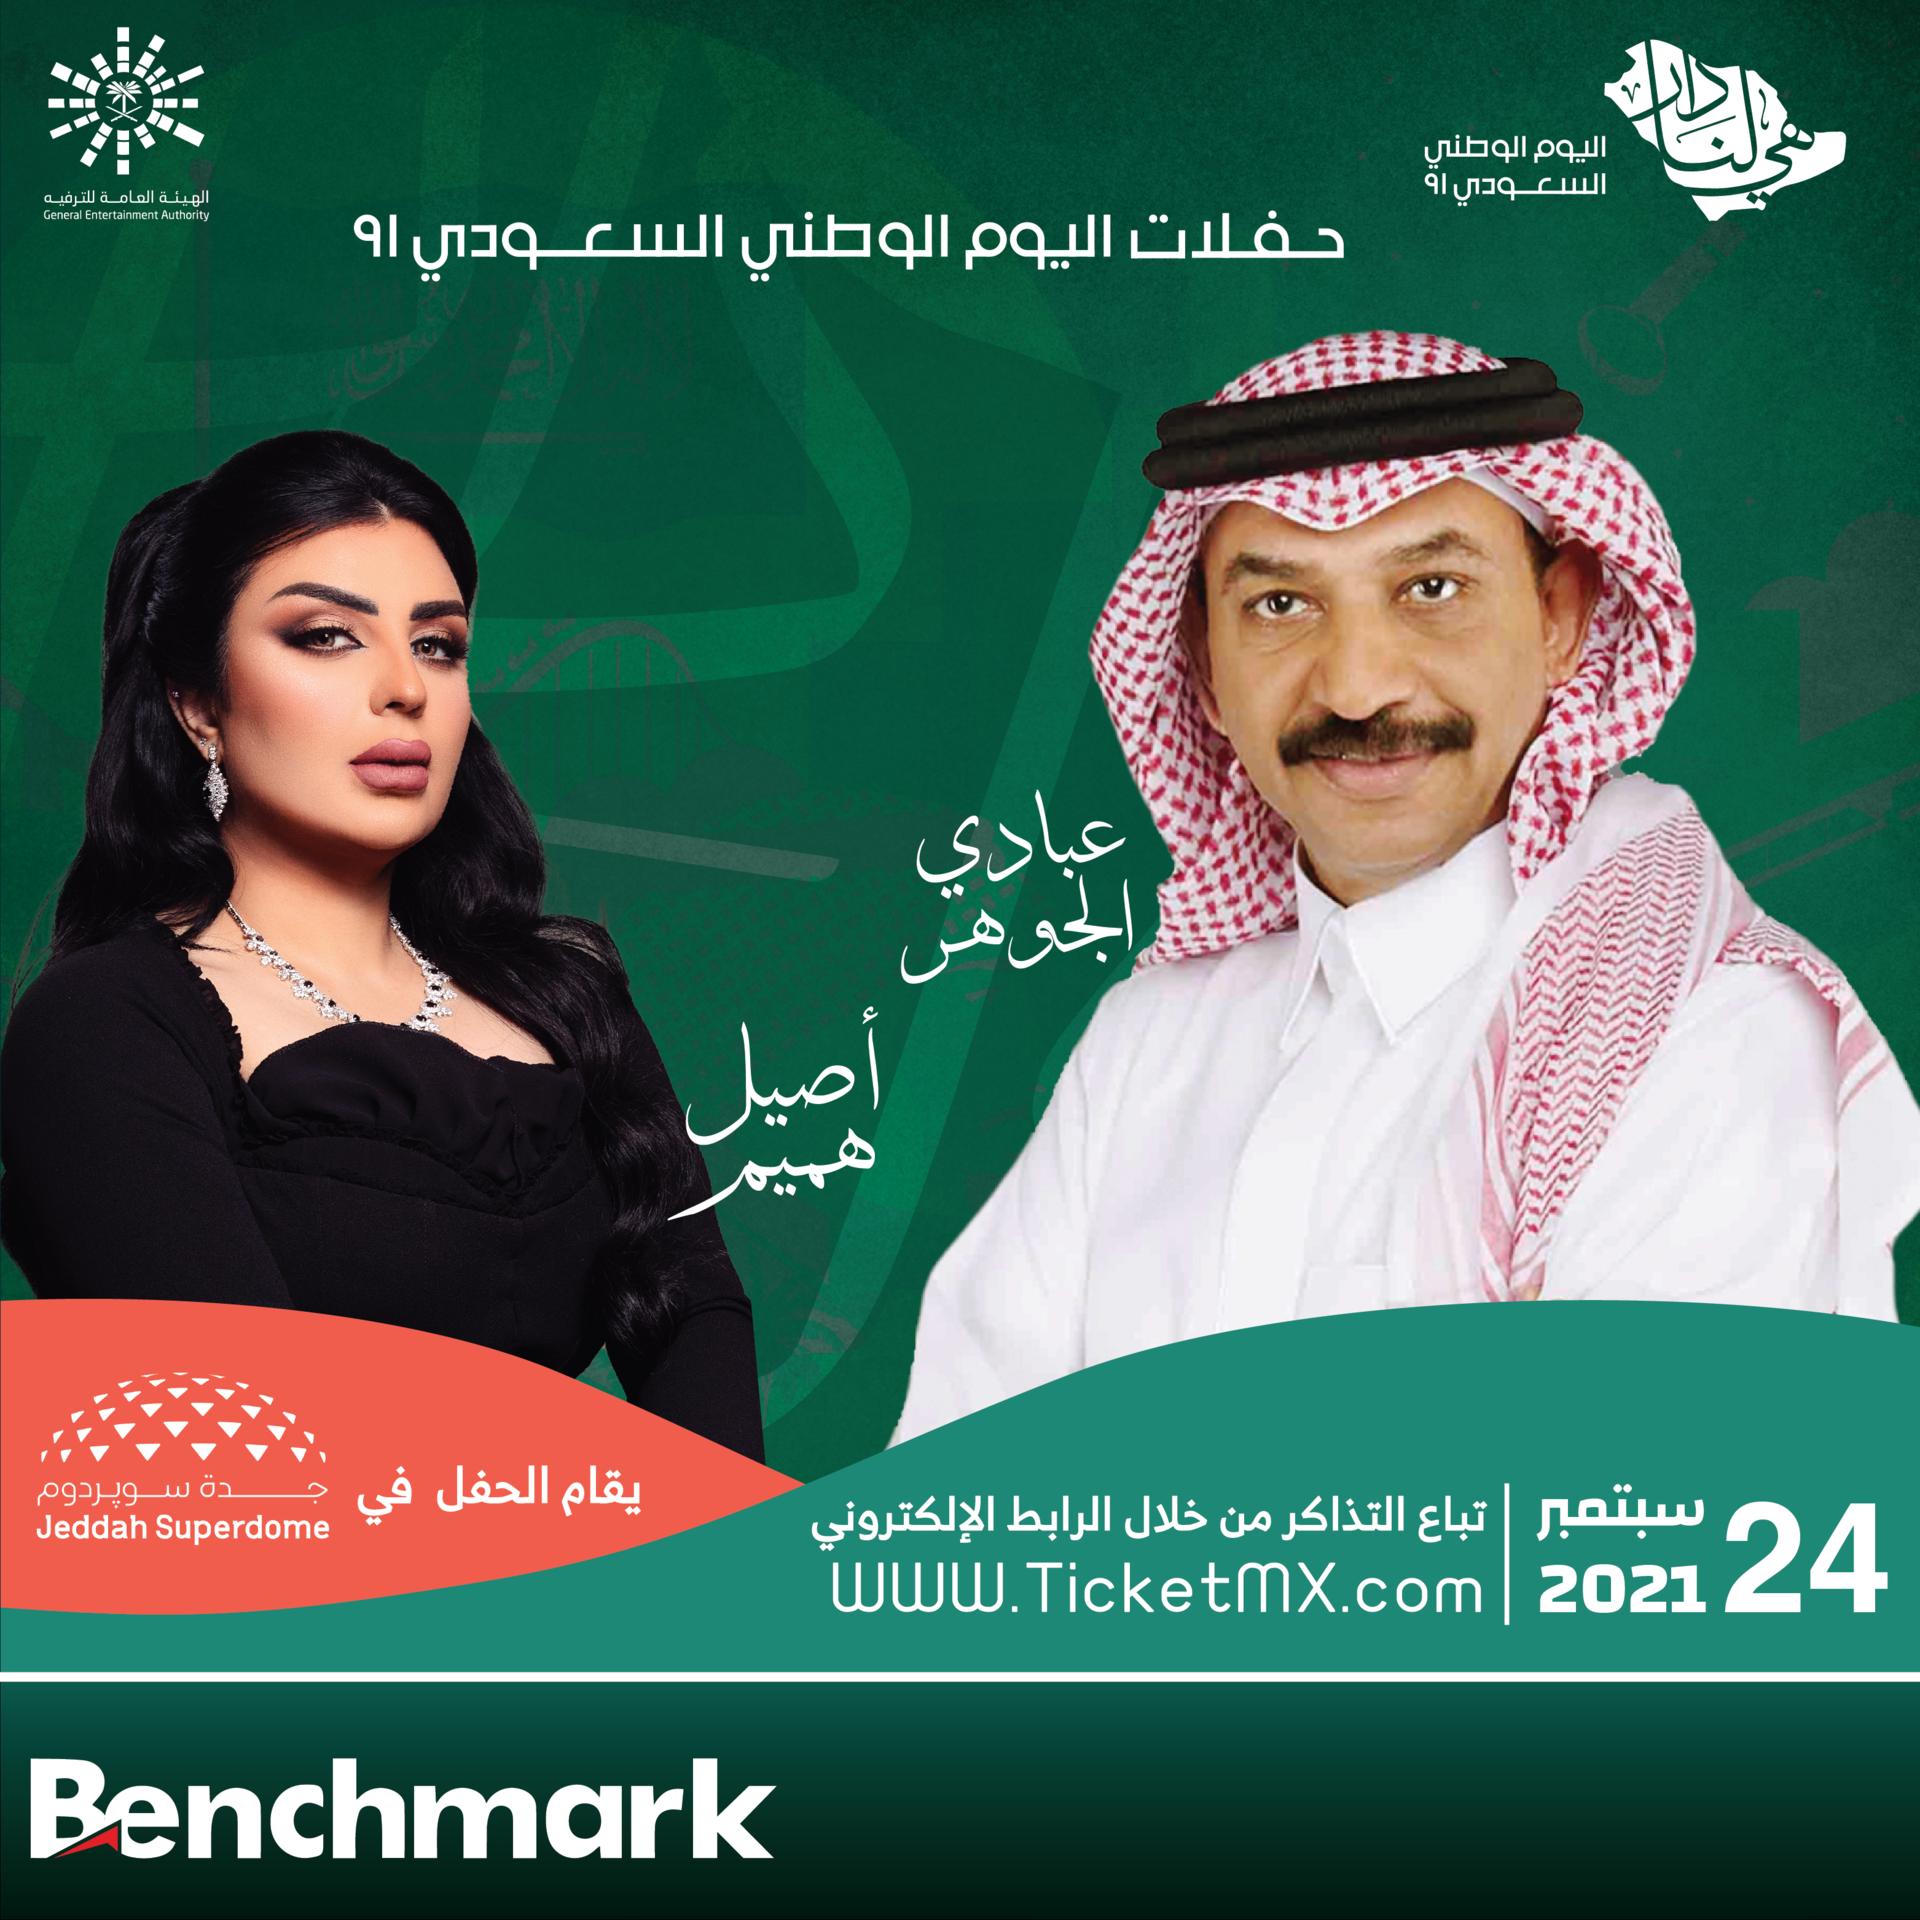 Abadi al-johar and Aseel hameem Concert